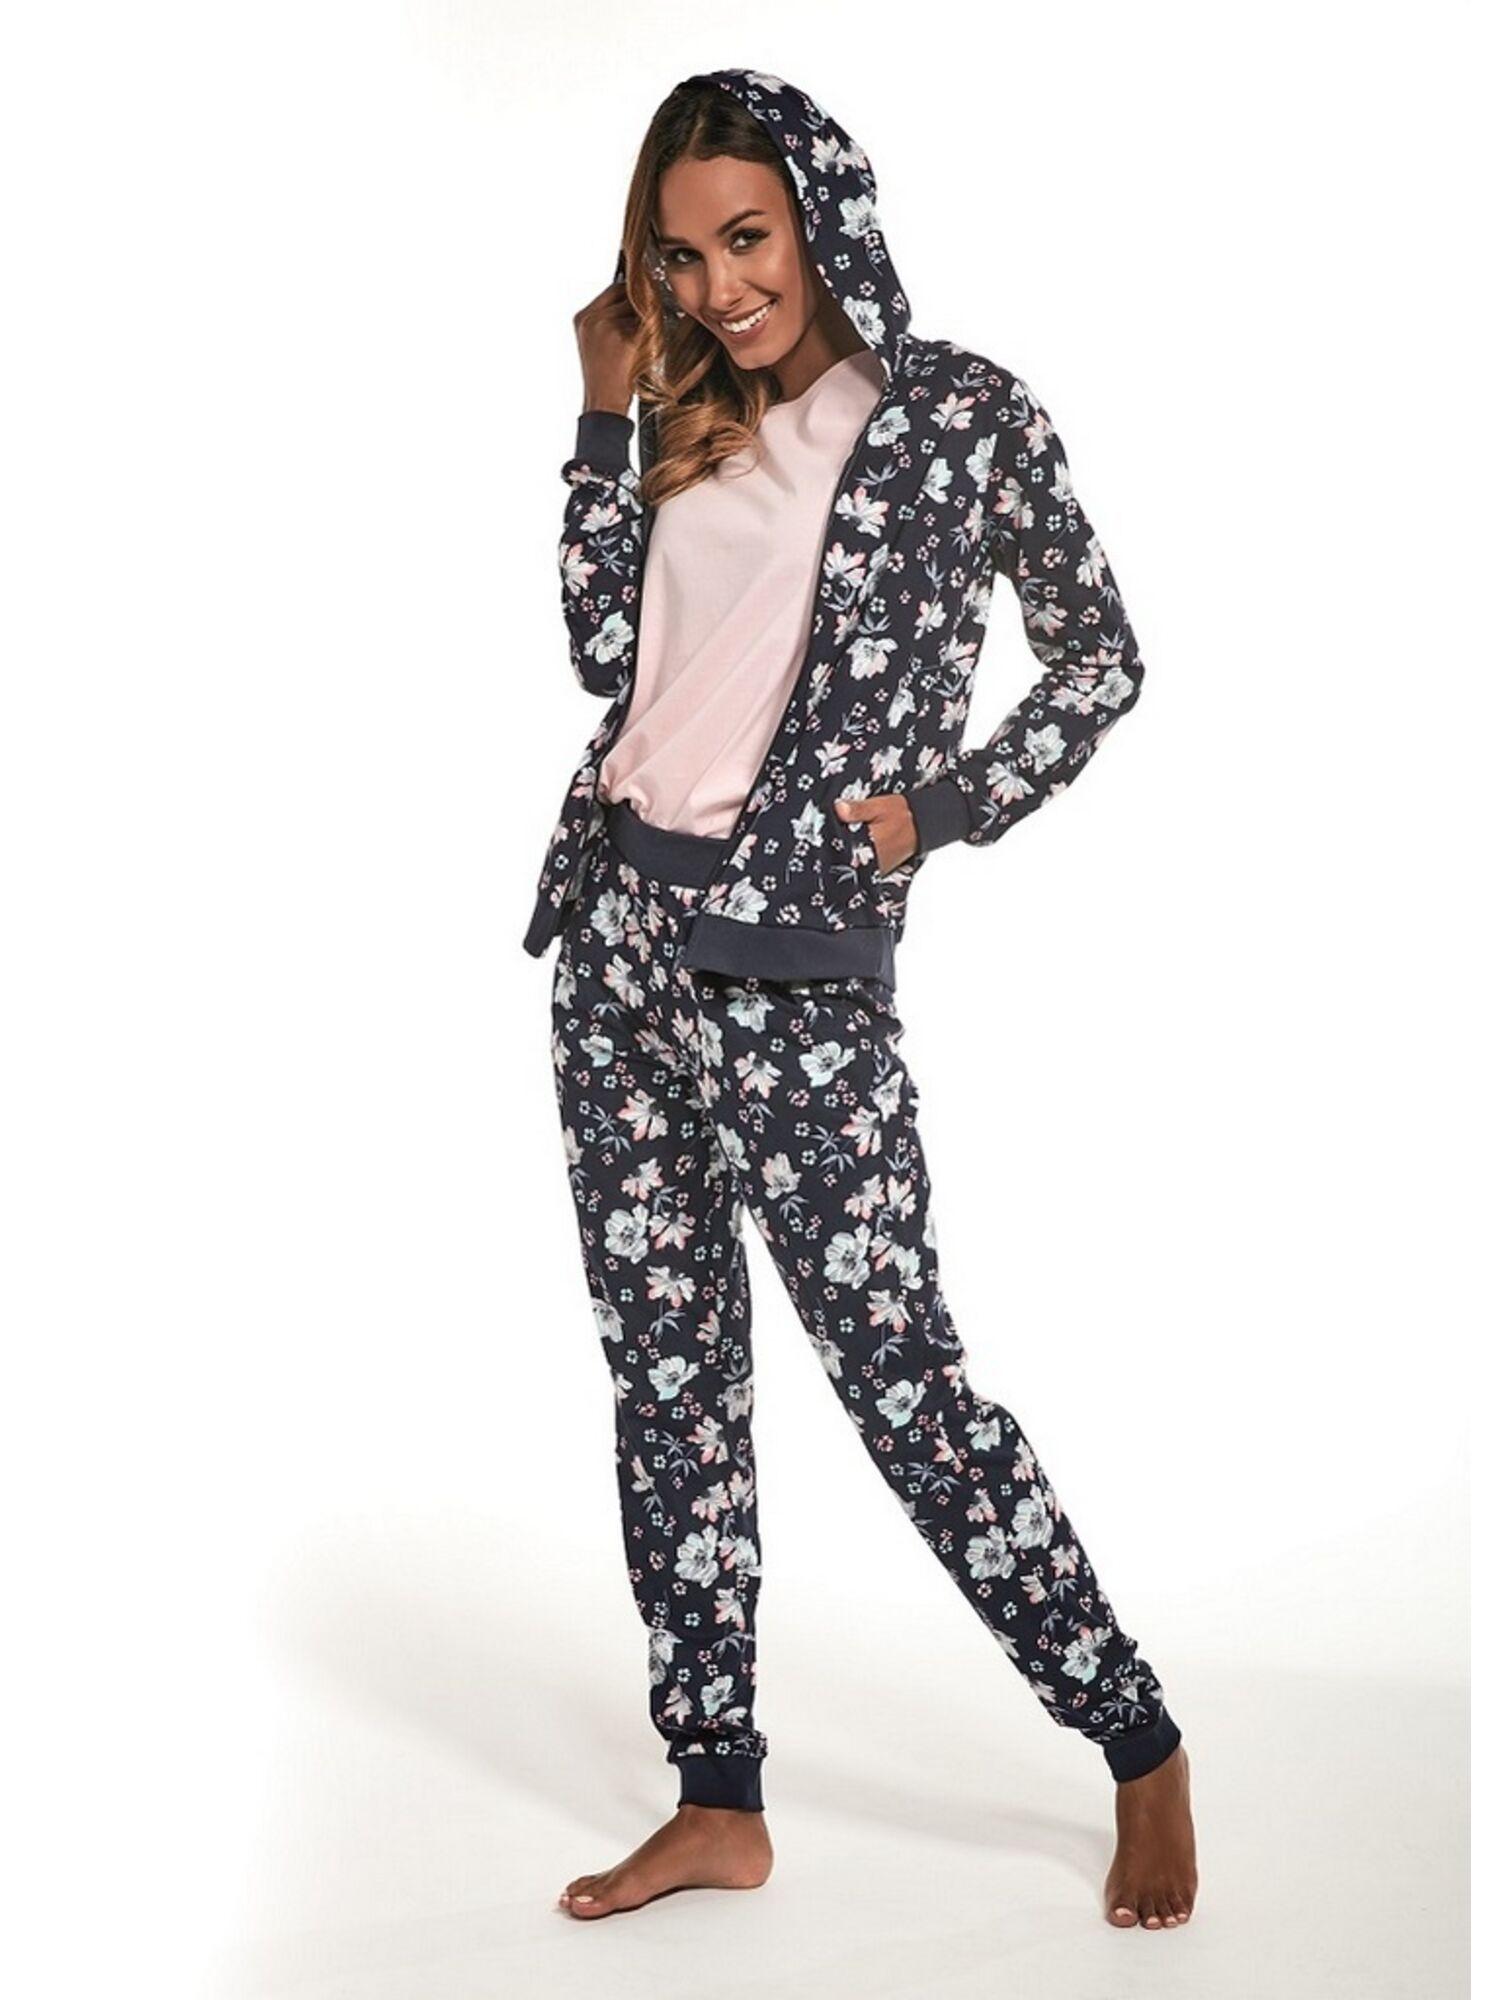 Комплект женский (кофта, штаны, футболка) из хлопка 355/215 JESSIE синий, CORNETTE